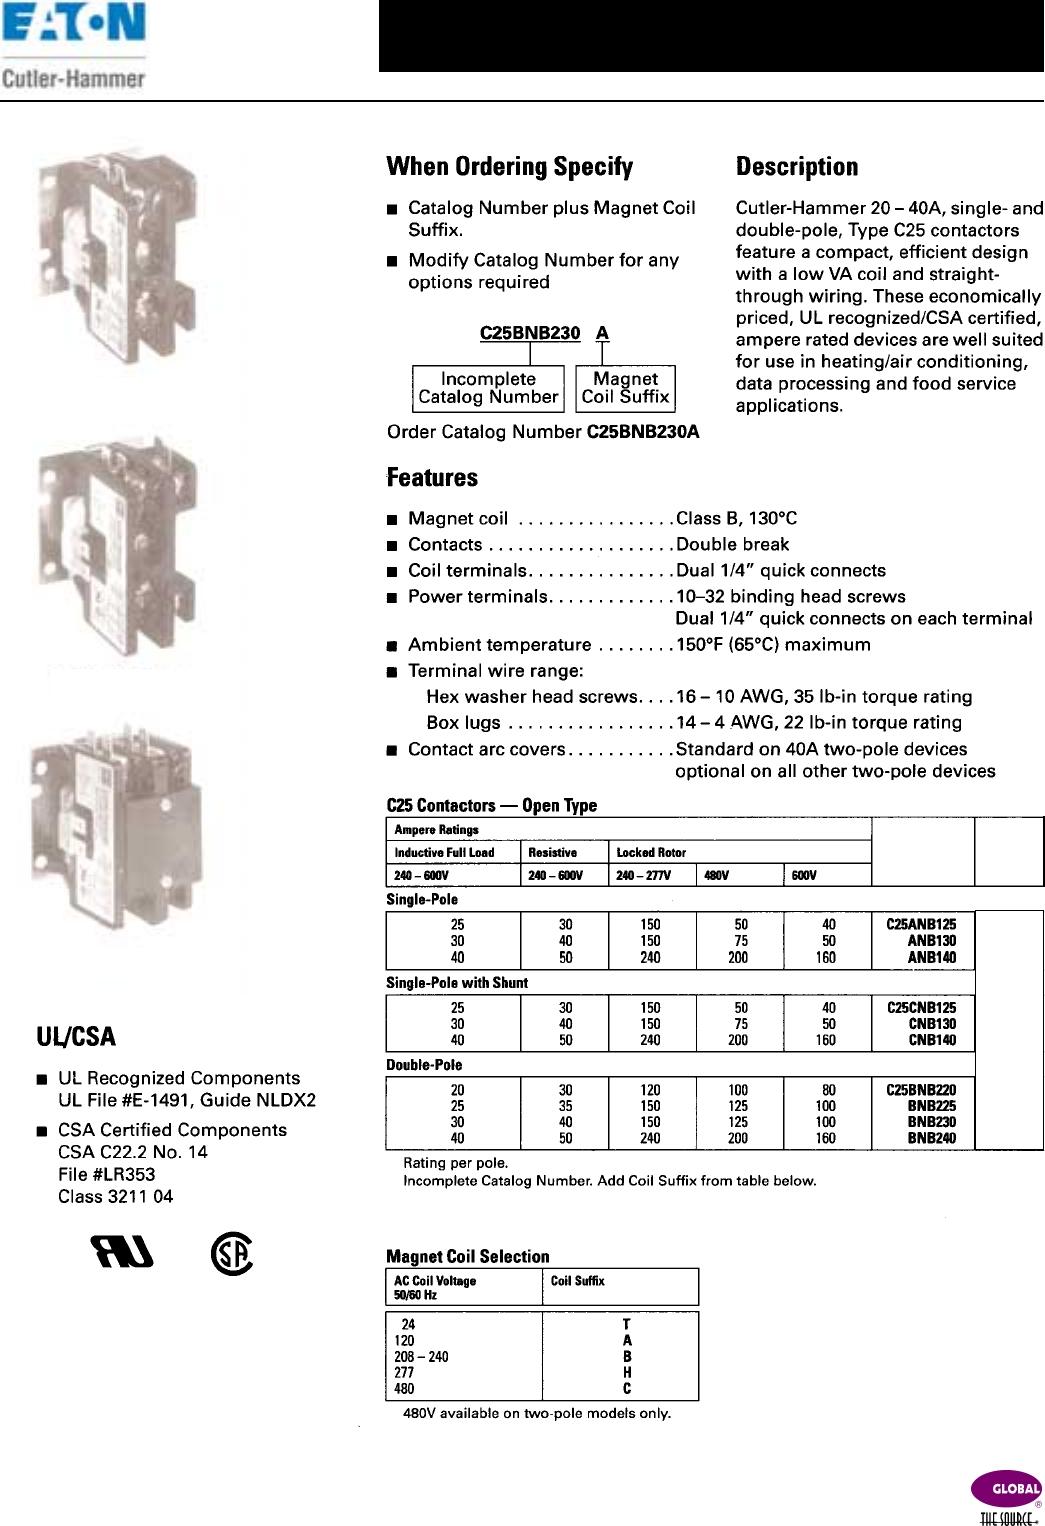 eaton c25bnb230a wiring diagram Download-Eaton C25bnb230a Wiring Diagram New Cat Master Bu Catalog 15-b